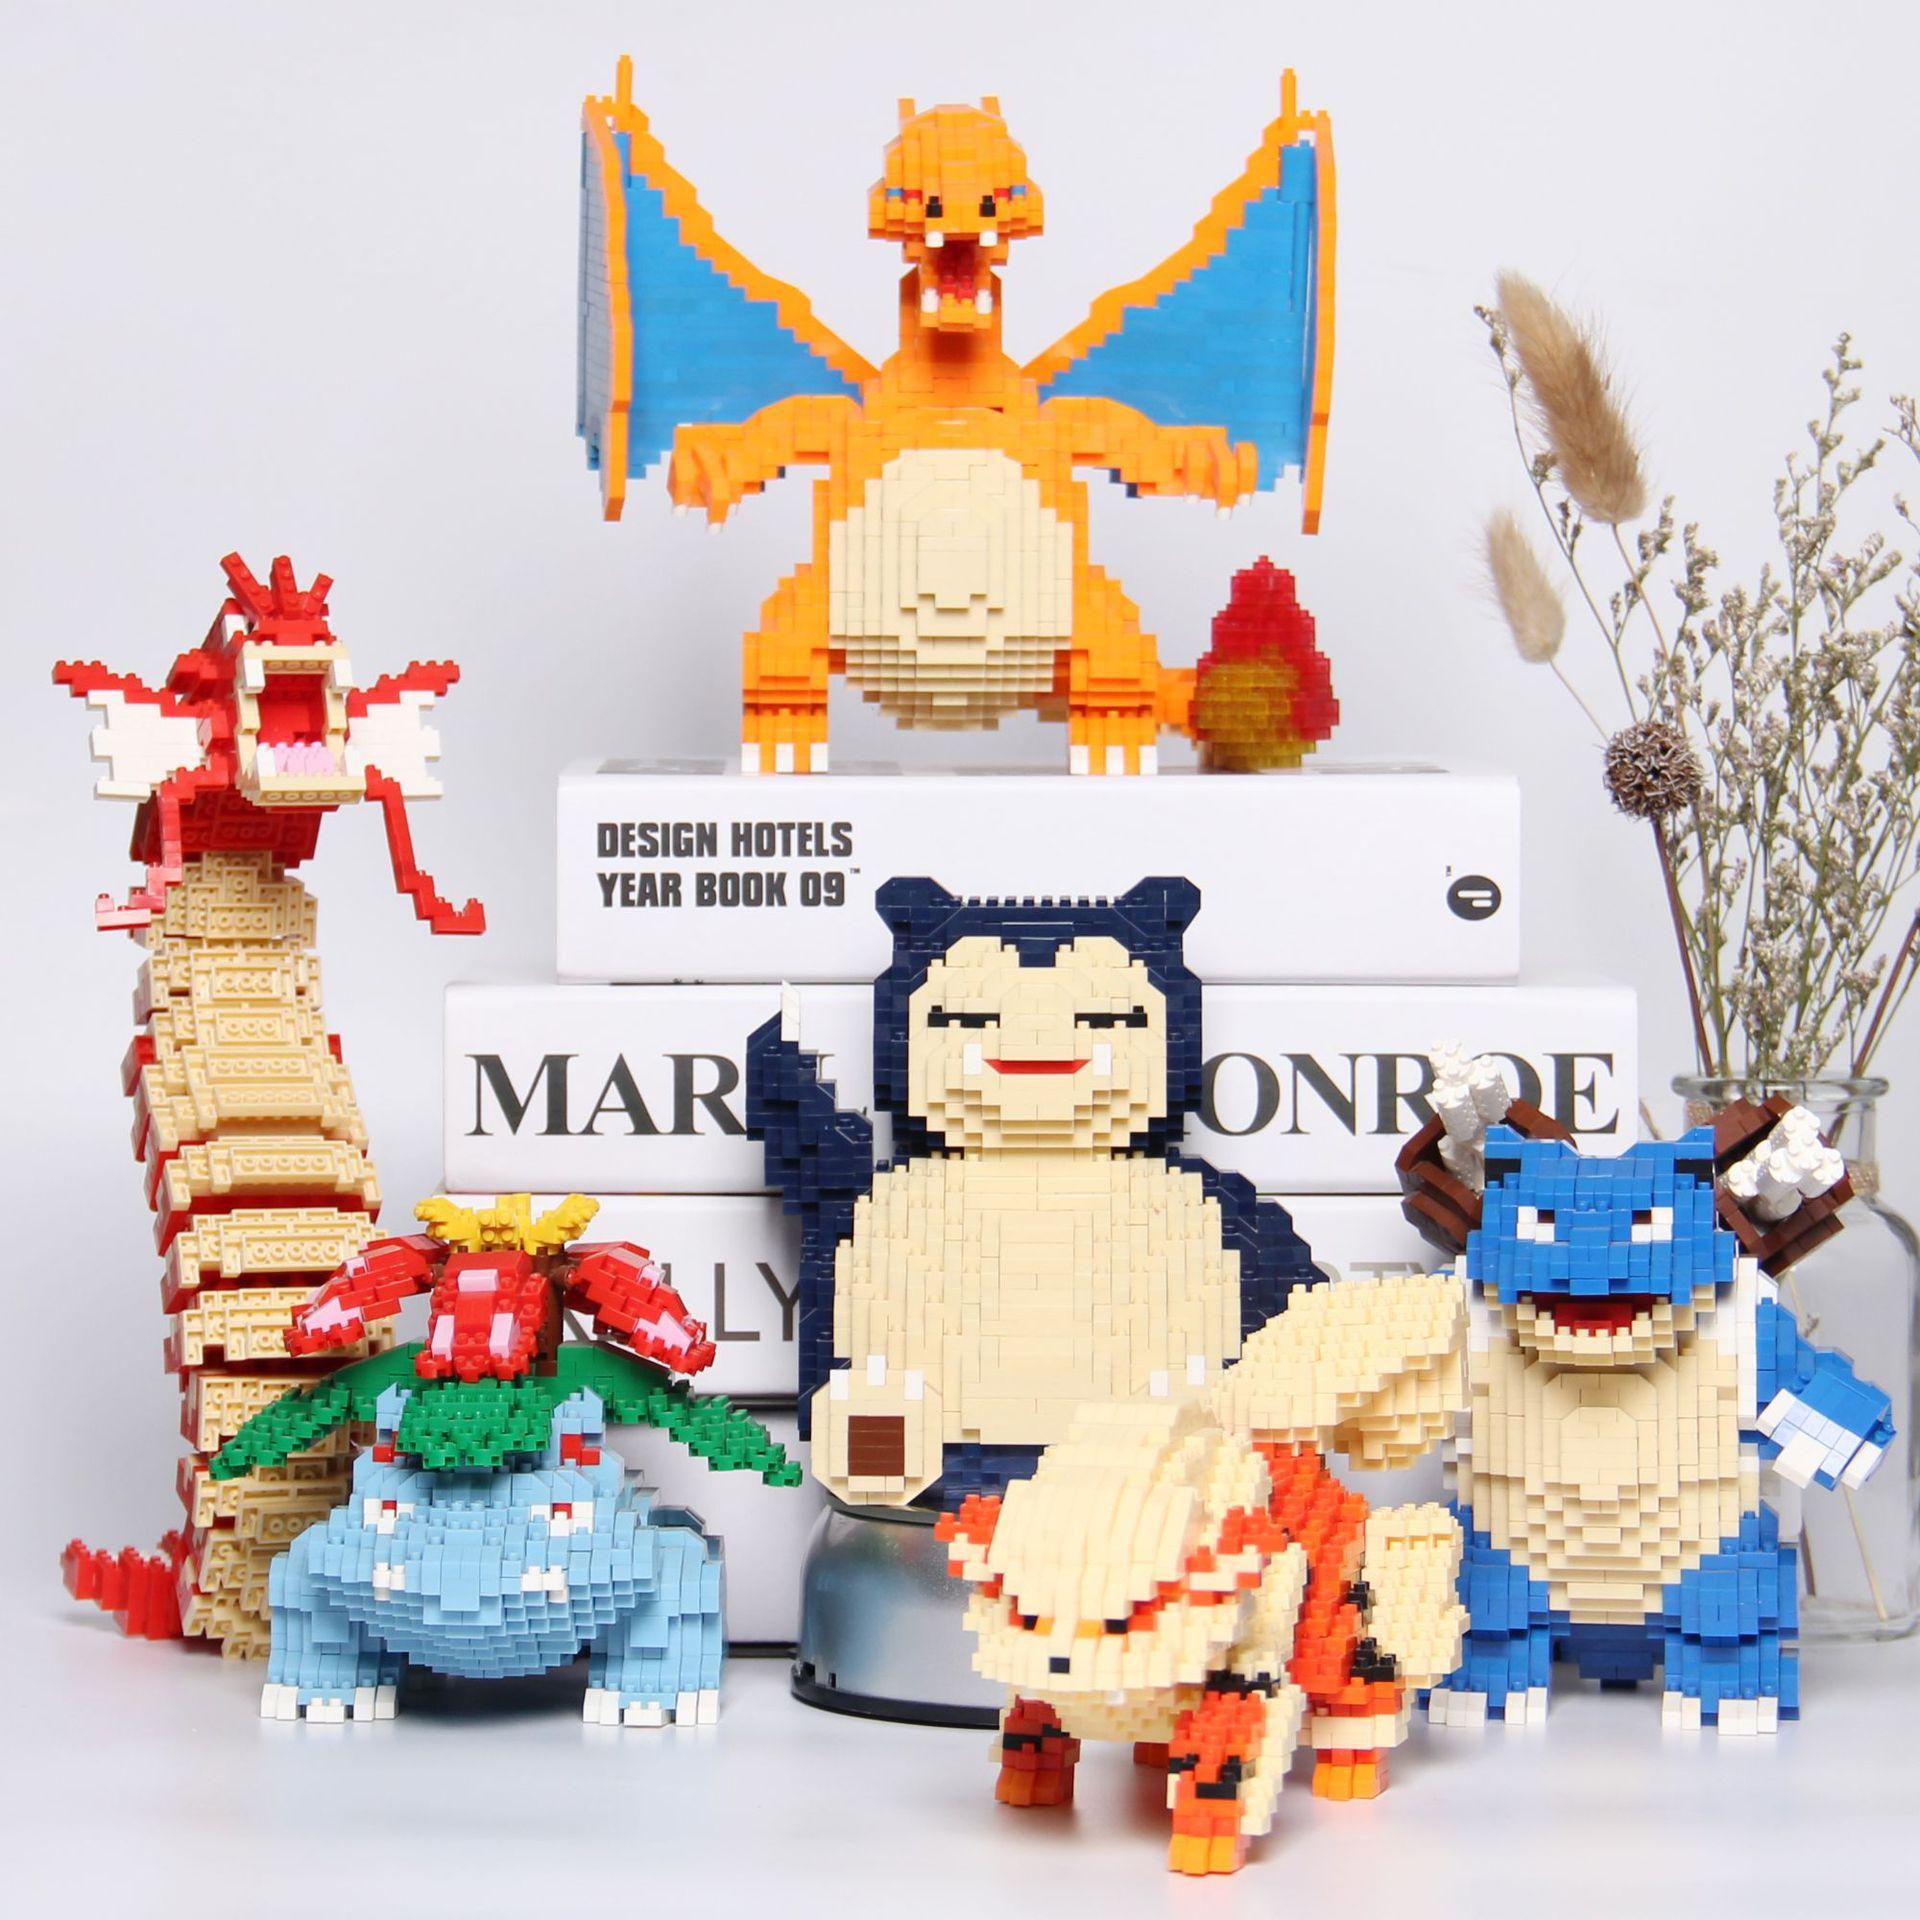 Mini bloque Anime Snorlax Charizard Bulbasaur figura modelo edificio Blastoise Gyarados DIY montado Mini ladrillos para regalo de niños